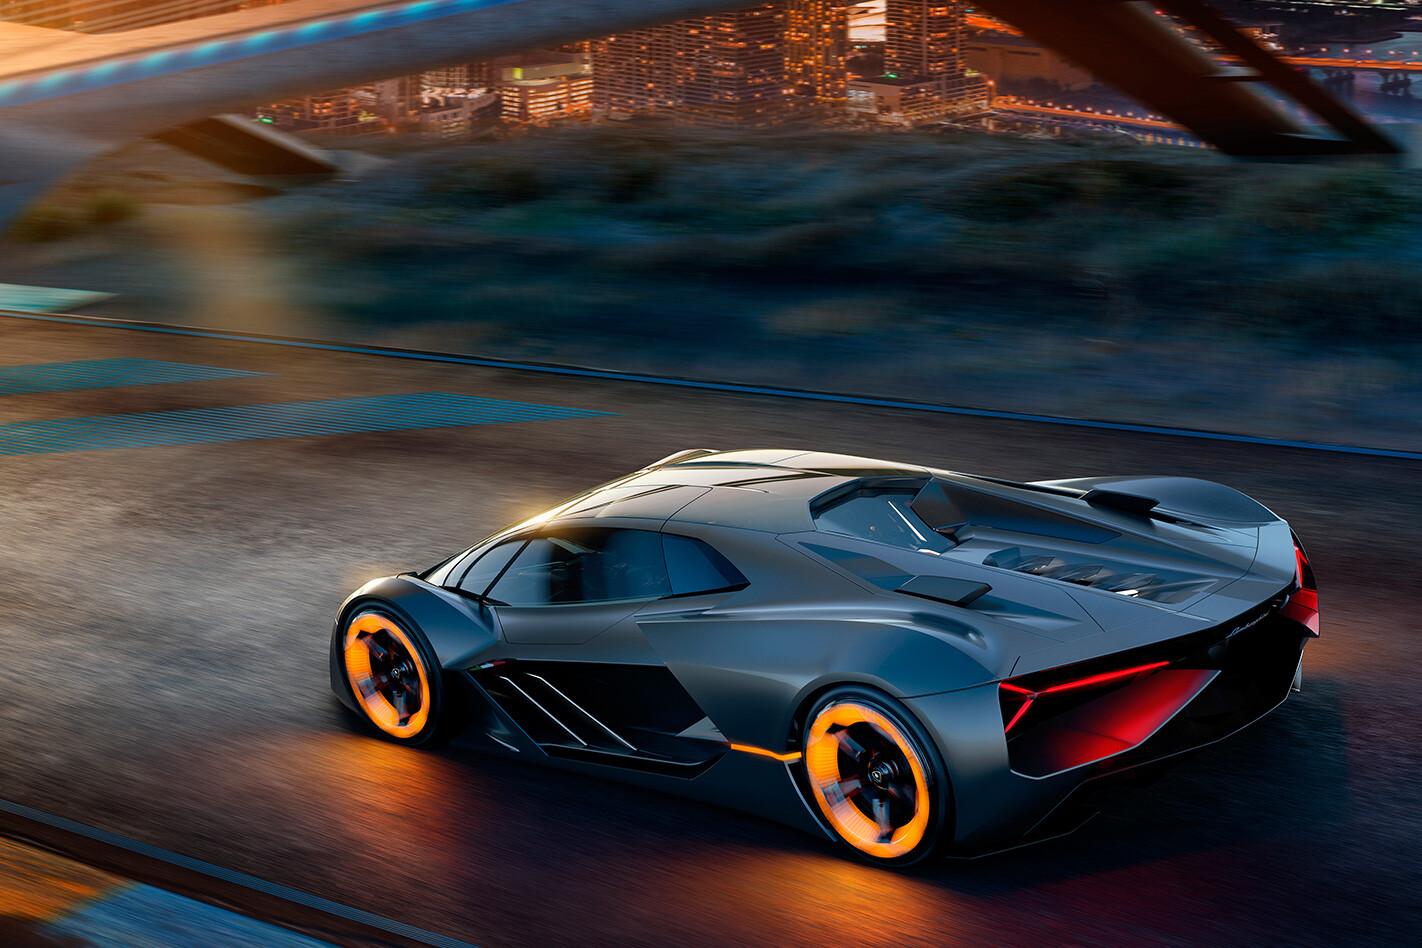 Lamborghini-Terzo-Millennio-tailights.jpg